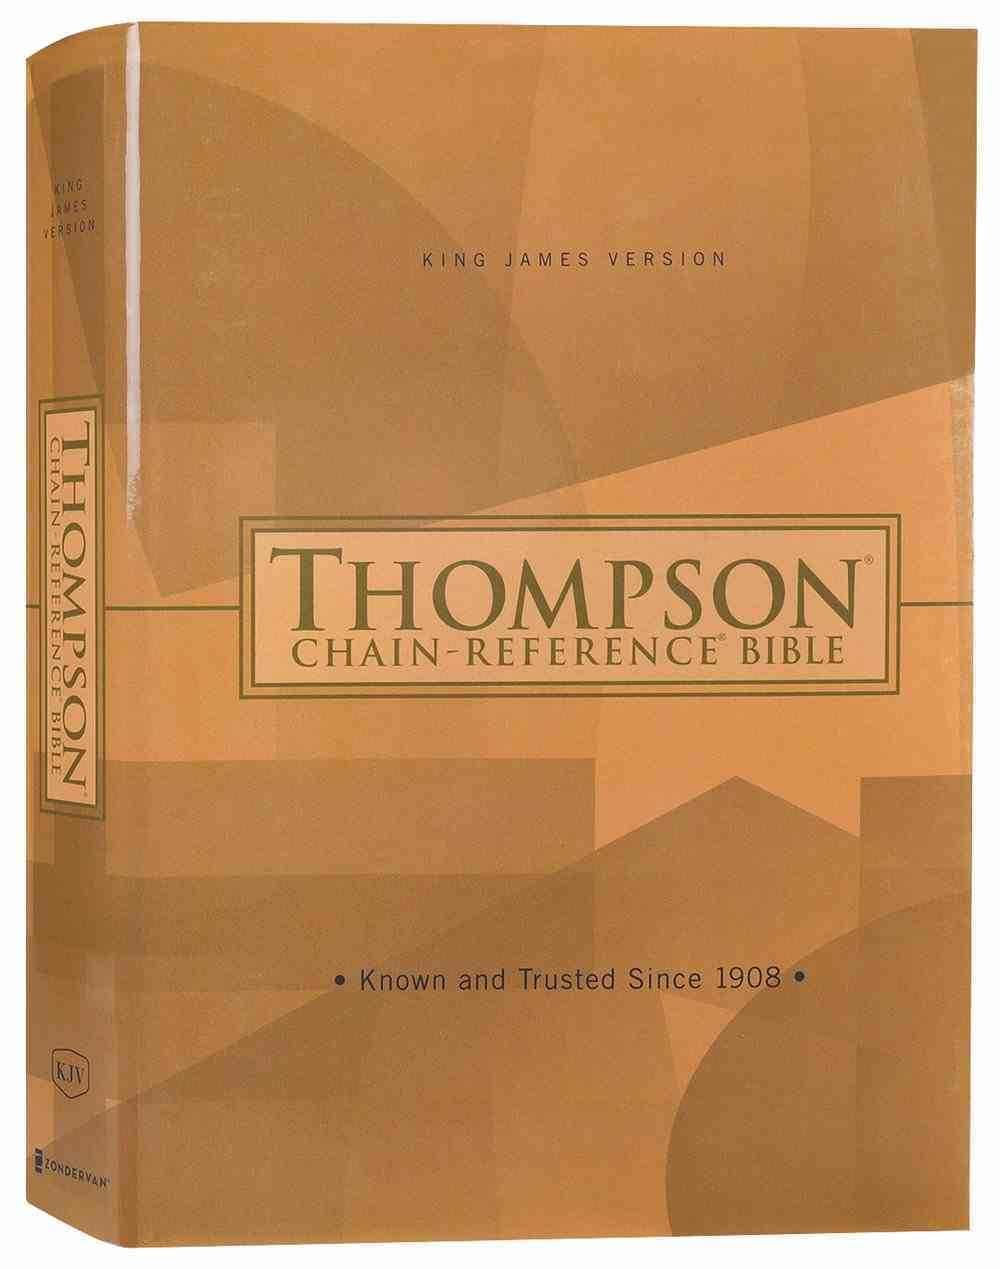 KJV Thompson Chain-Reference Bible (Red Letter Edition) Hardback